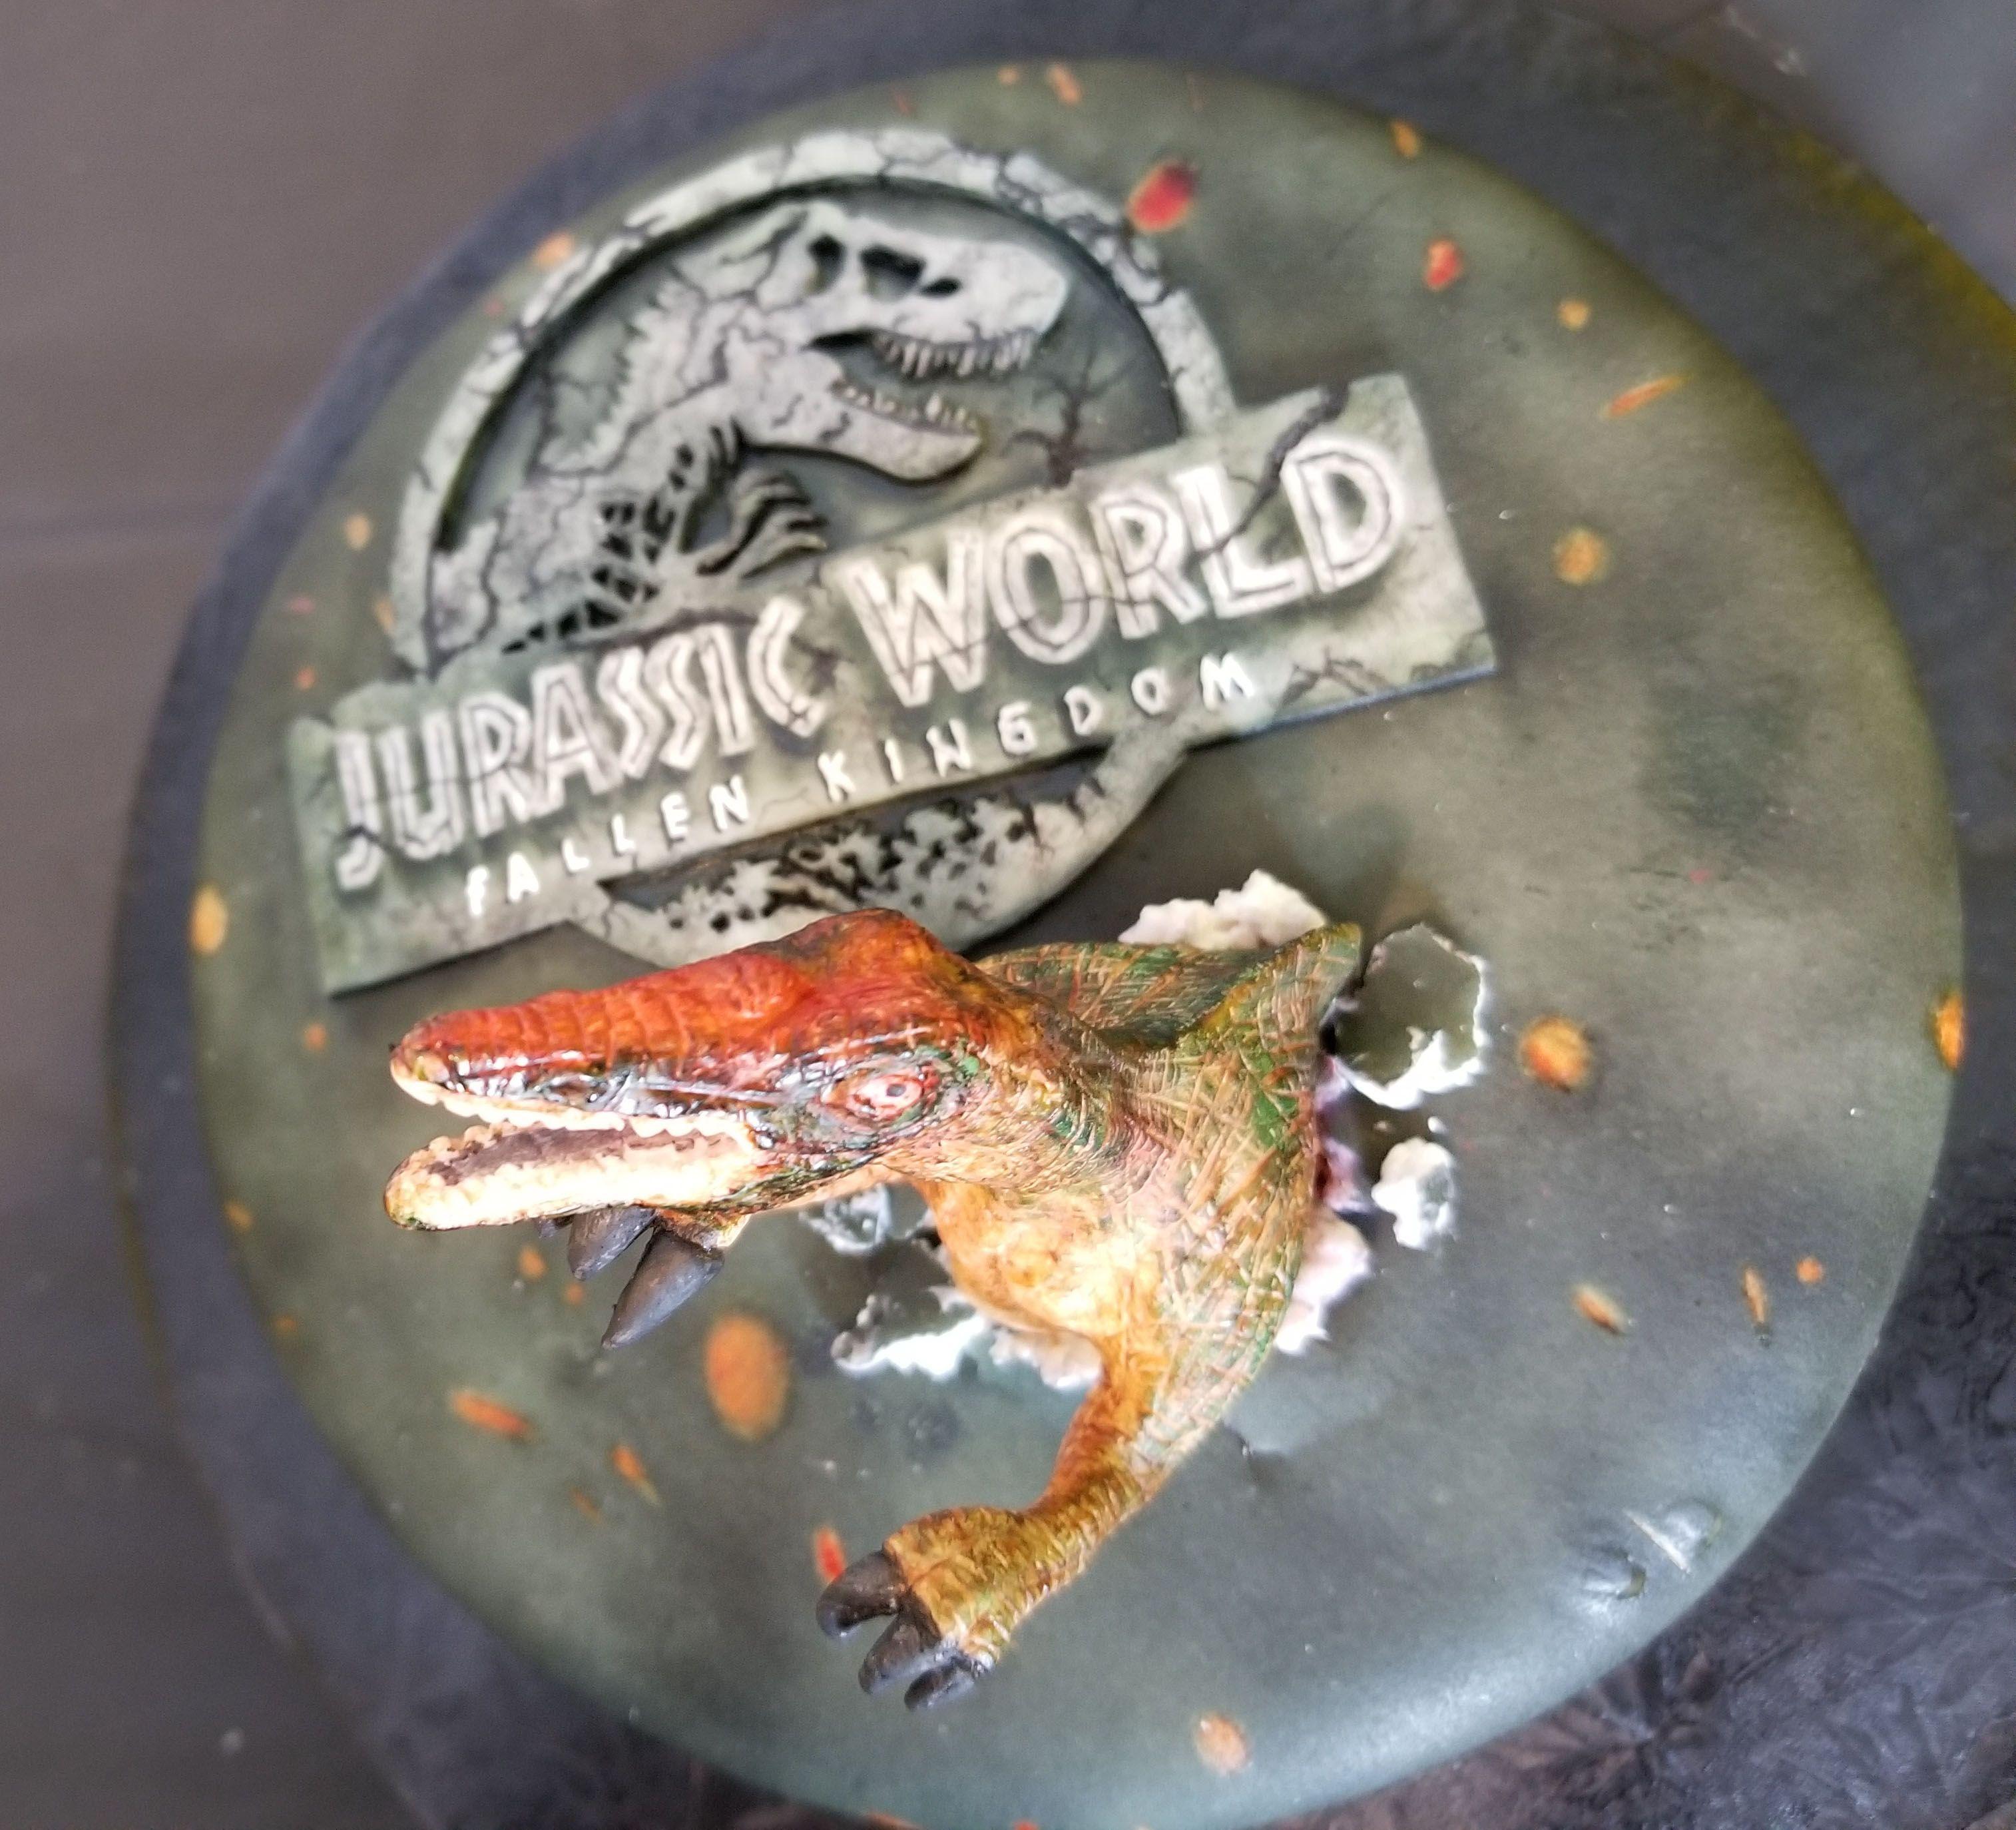 Jurassic World 2: Fallen Kingdom Cake Tutorial On YouTube